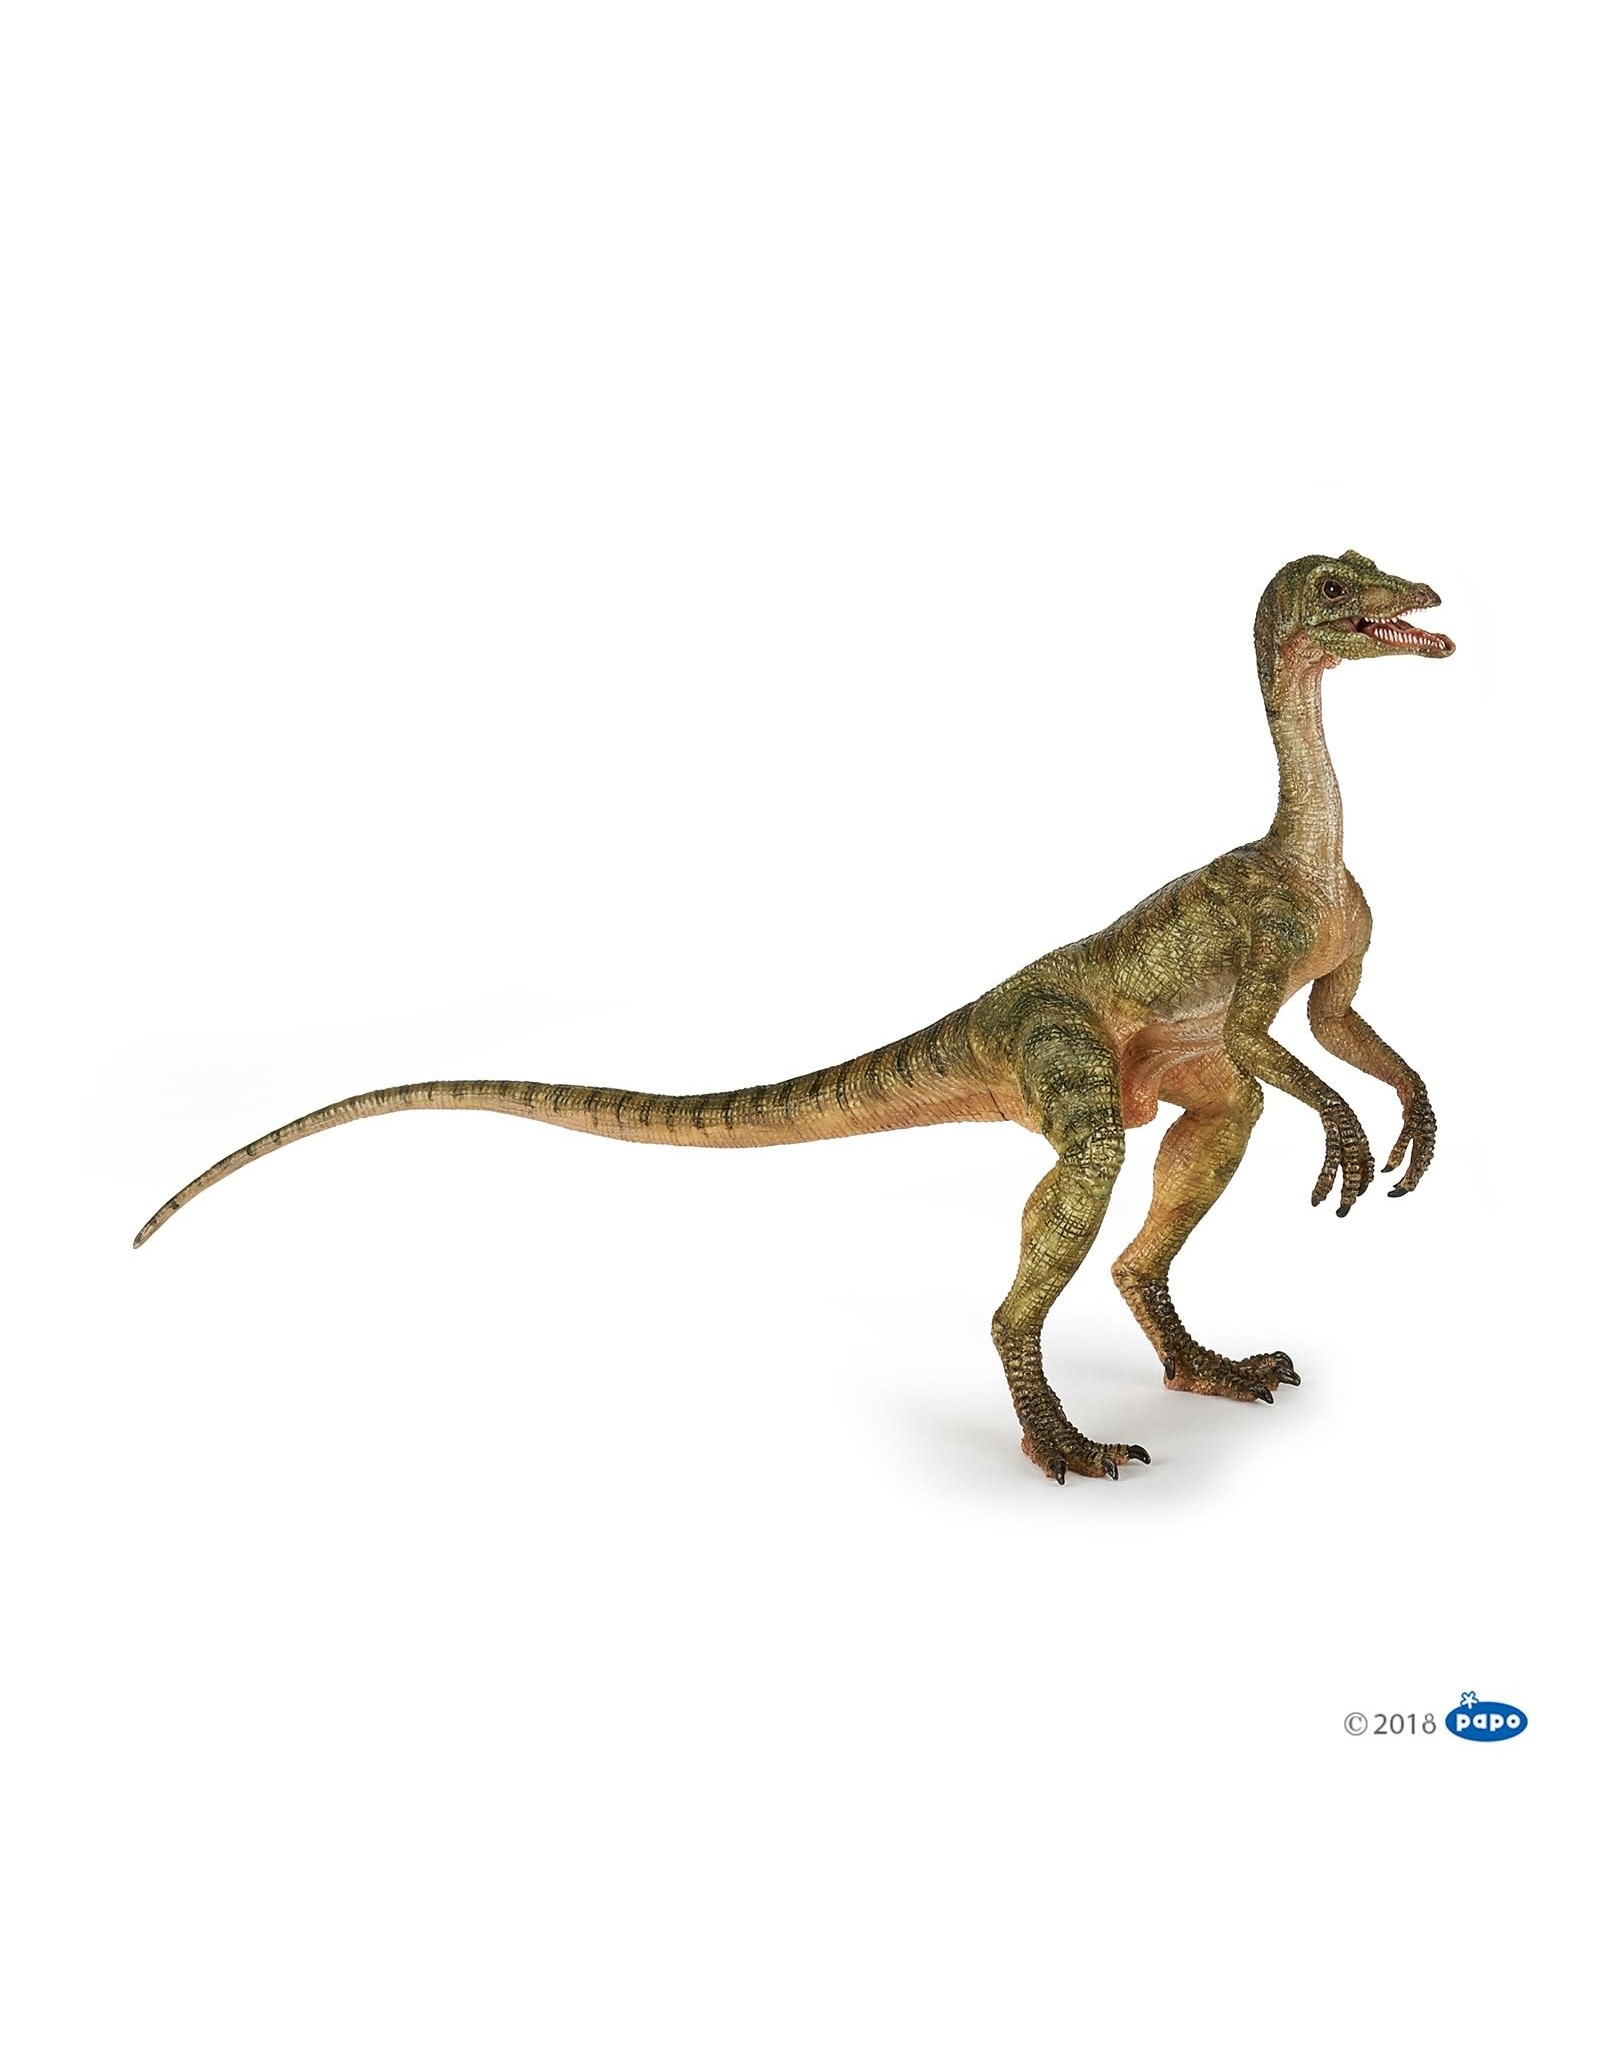 Papo Compsognathus - Papo Dinosaurs